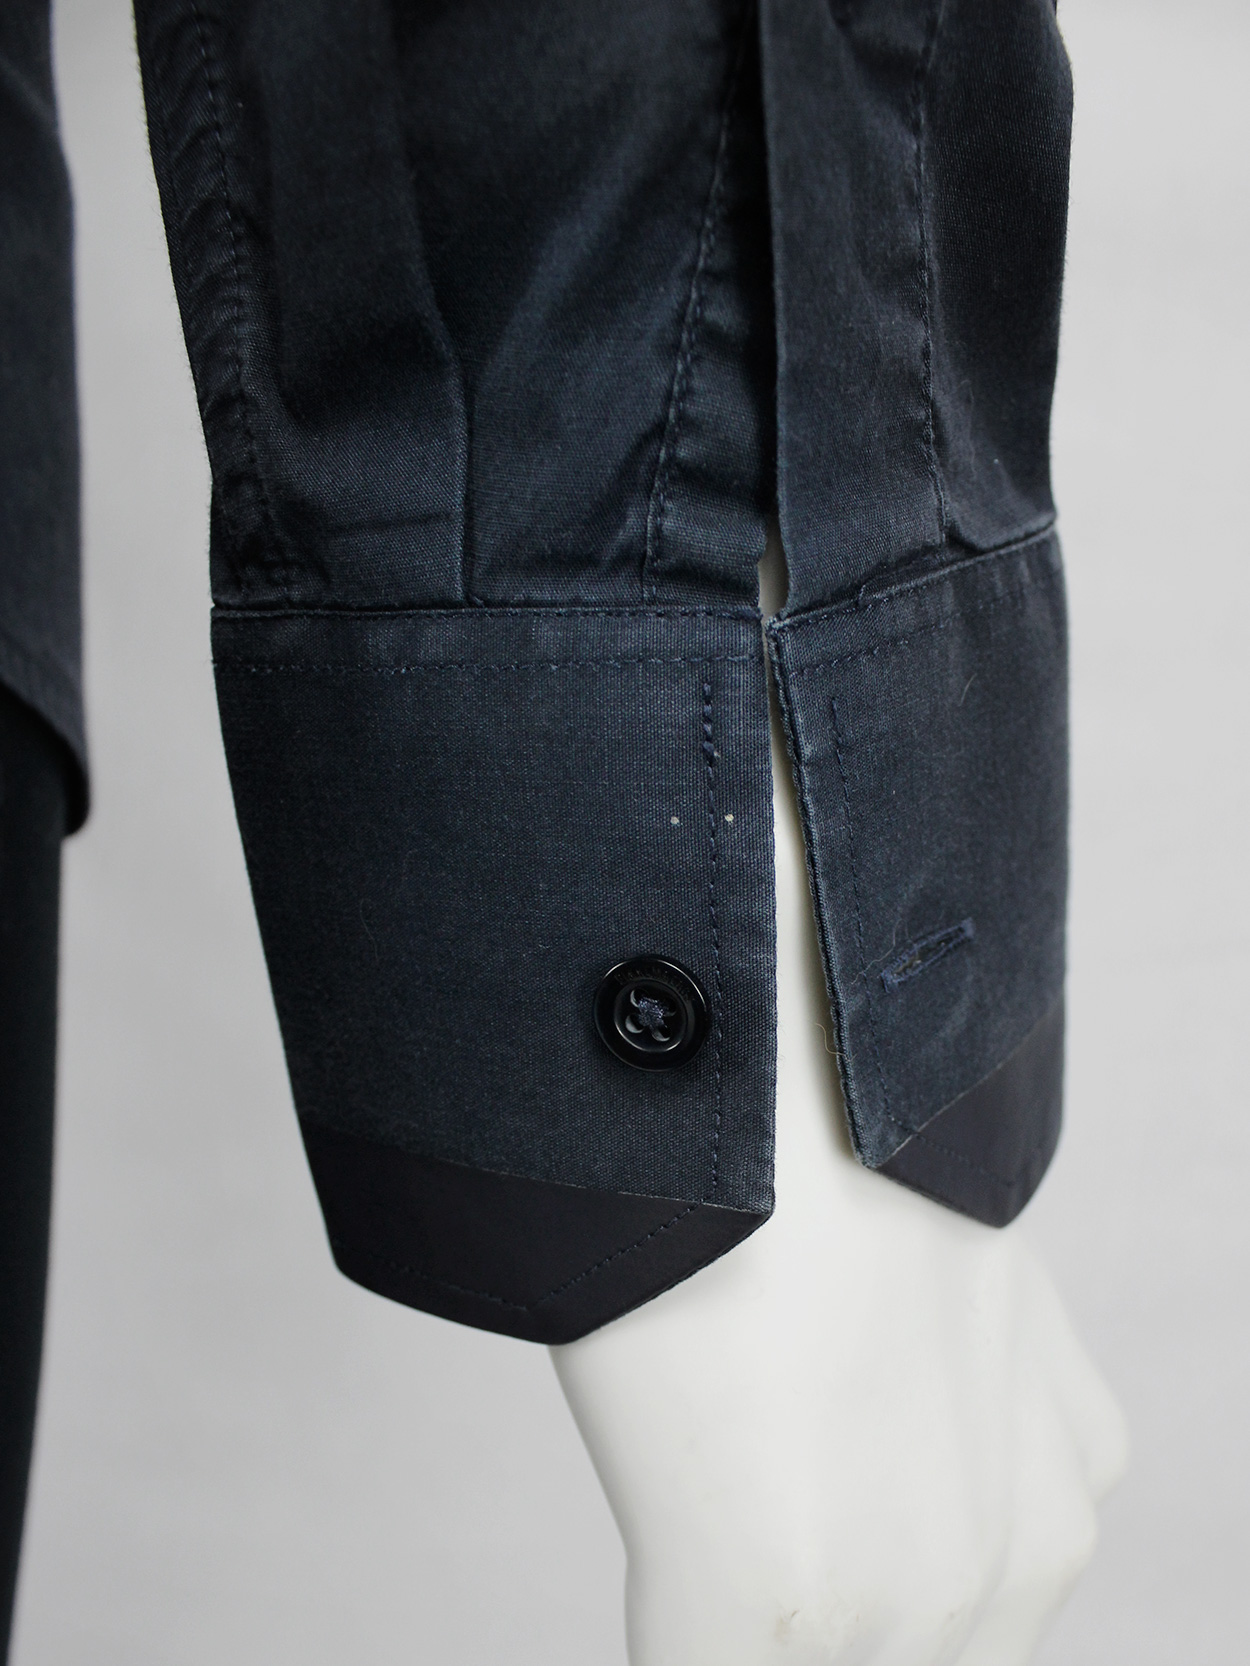 vaniitas vintageDirk Bikkembergs blue shirt with laminated trims on the collar and cuffs 3871